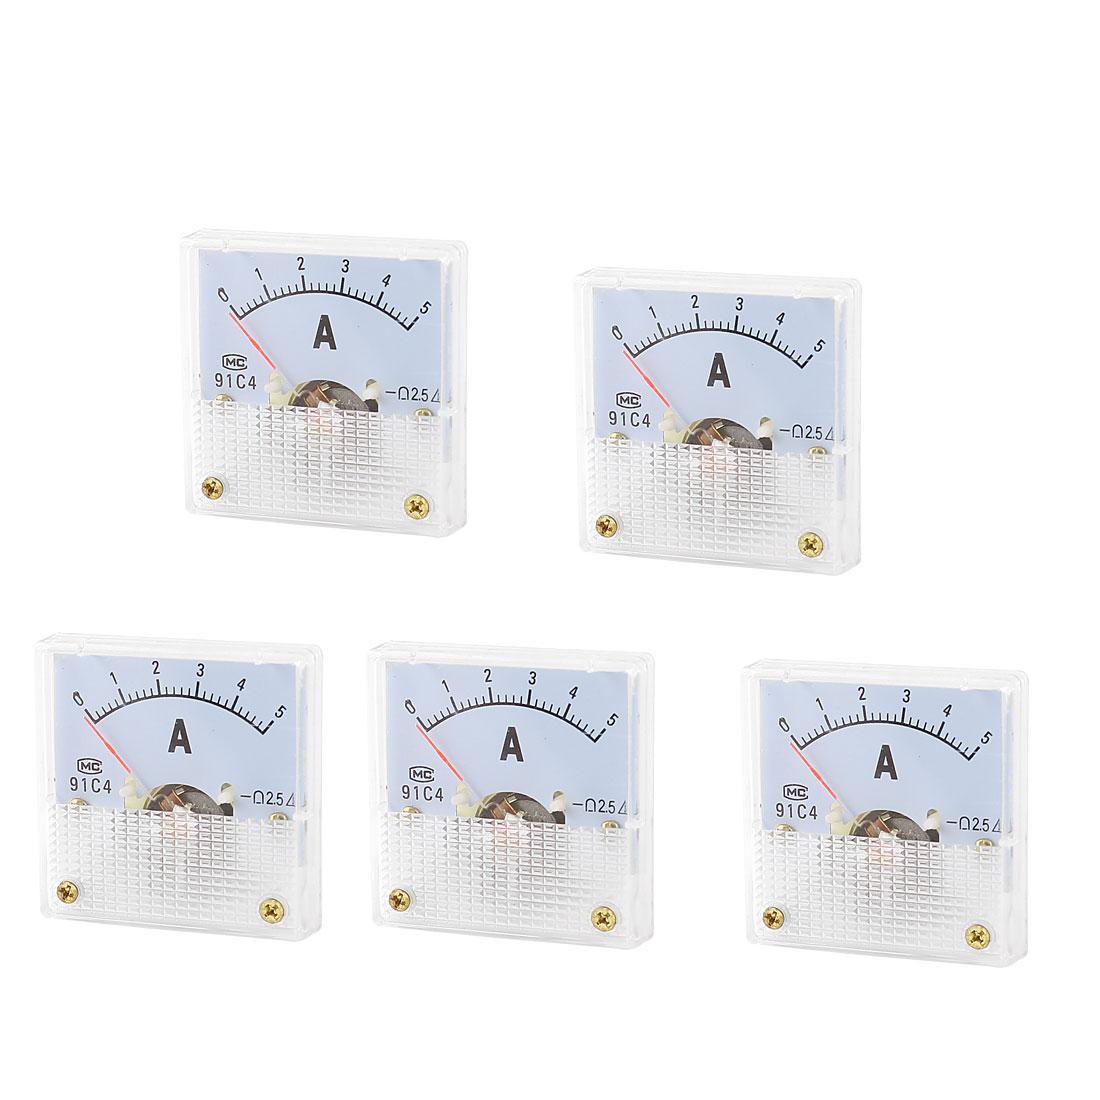 White Mounting Head DC 5A Current Amperemeter Panel Meter Gauge 5Pcs